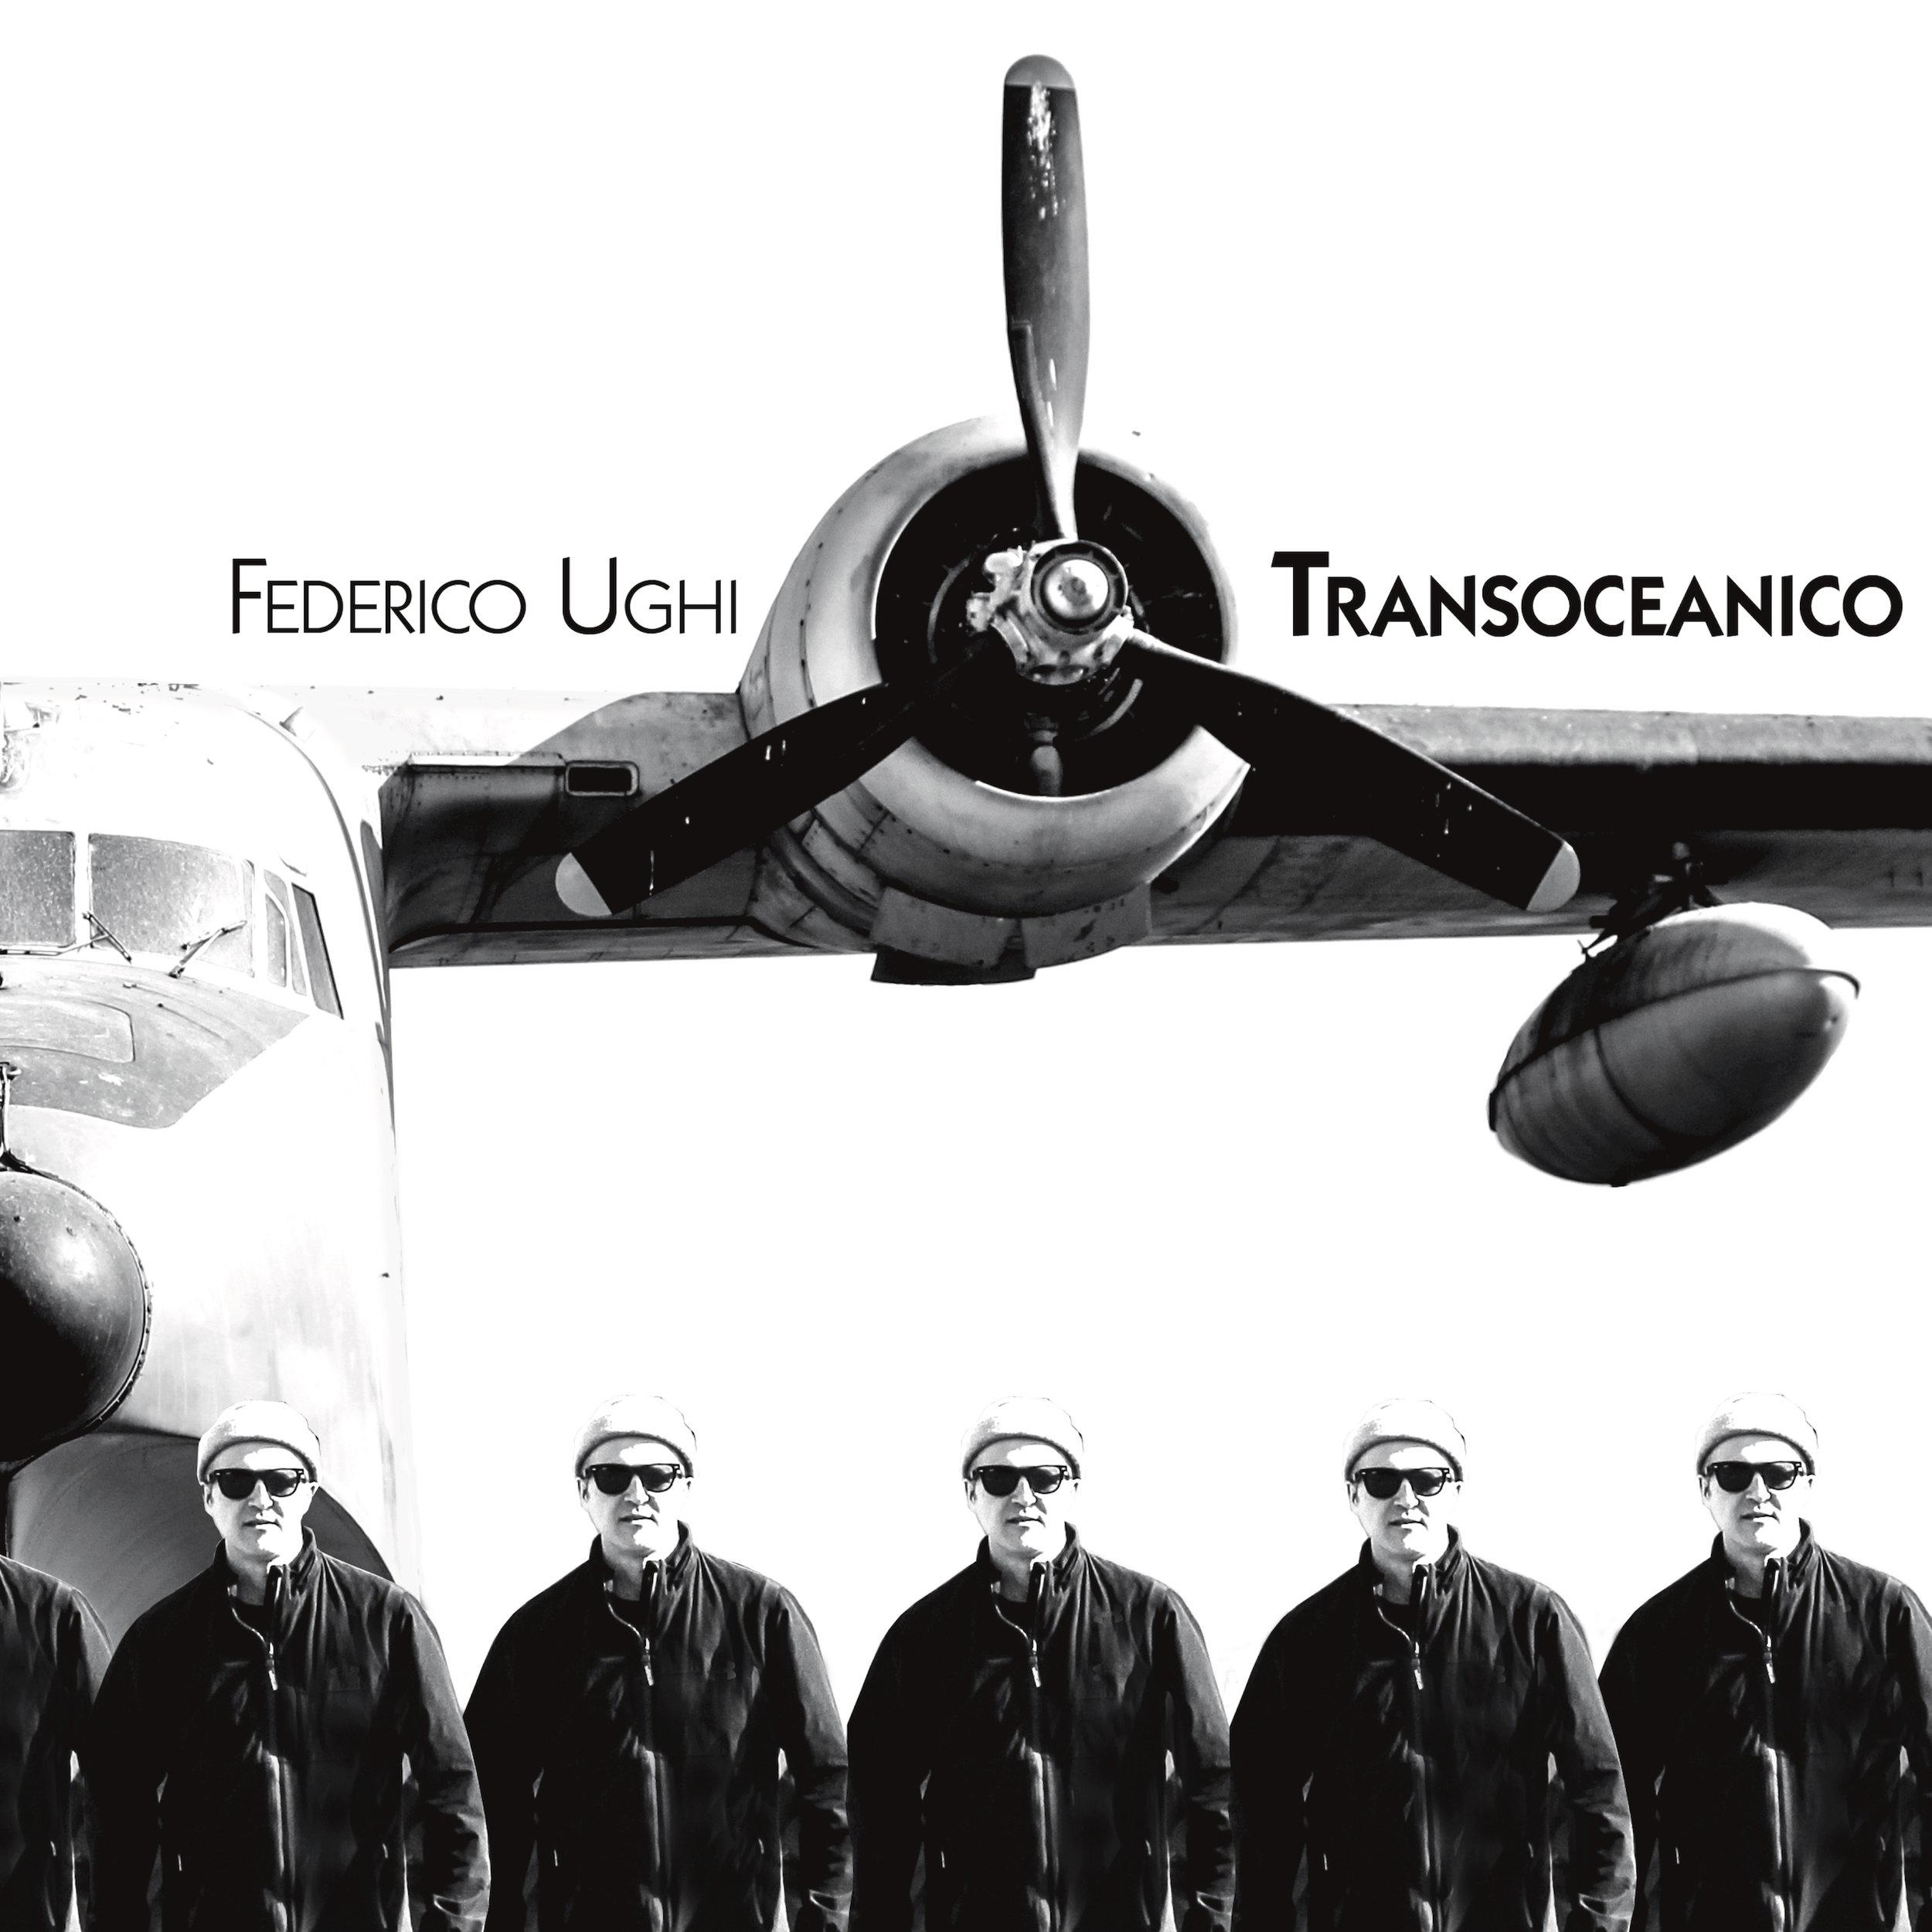 FEDERICO UGHI TRANSOCEANICO